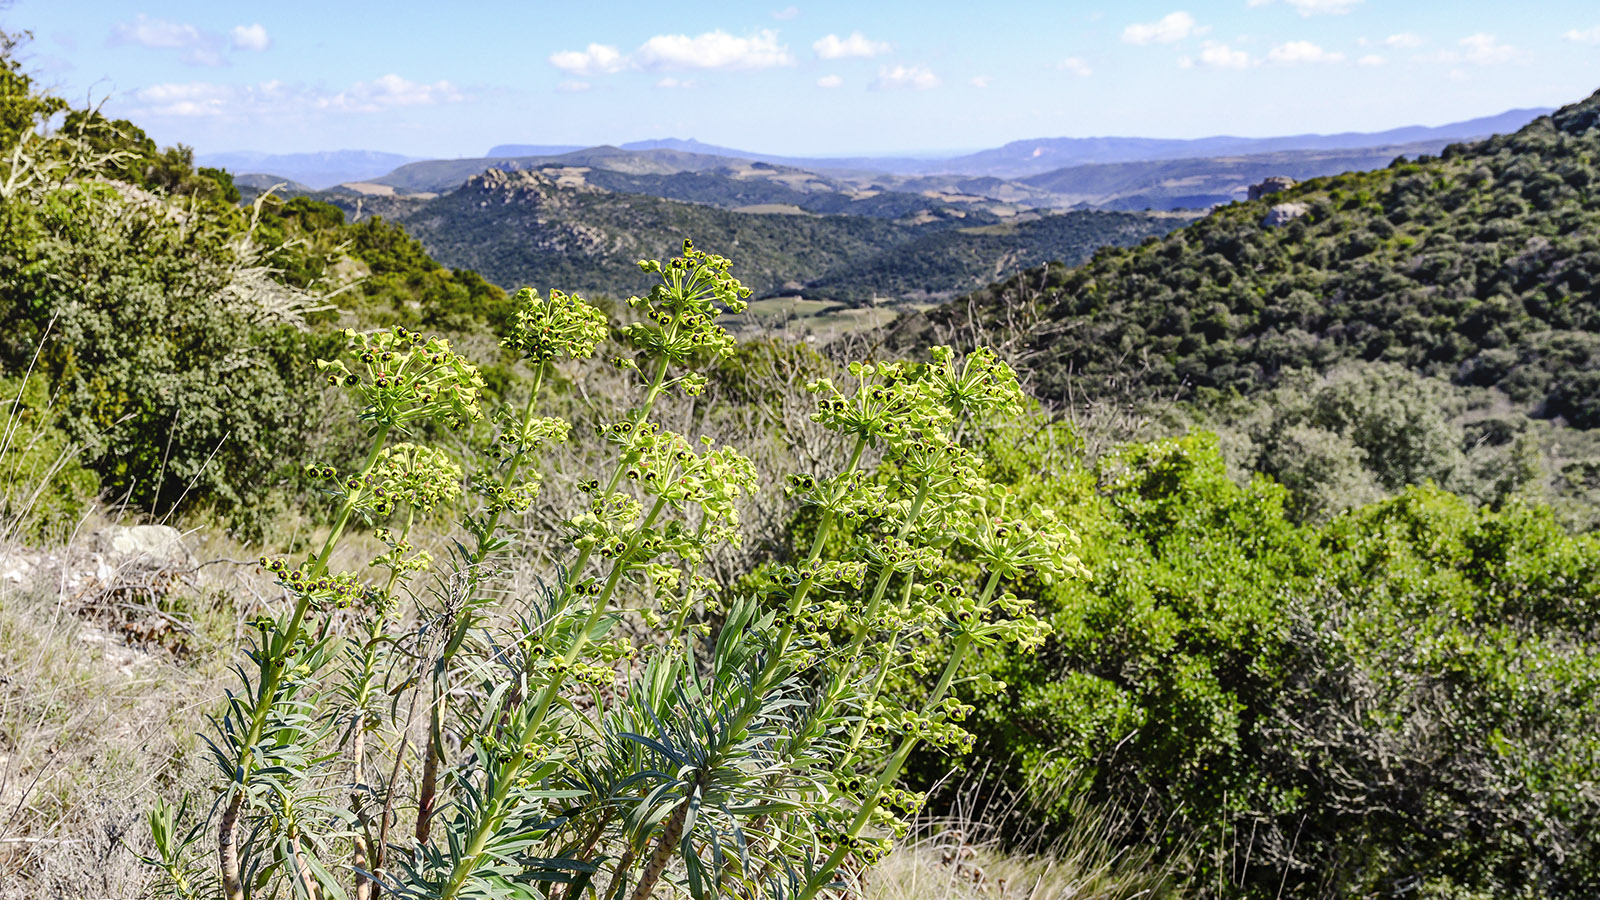 Euphorbien blühen allerorten in der Garrigue derTour de Lansac. Foto: Hilke Maunder